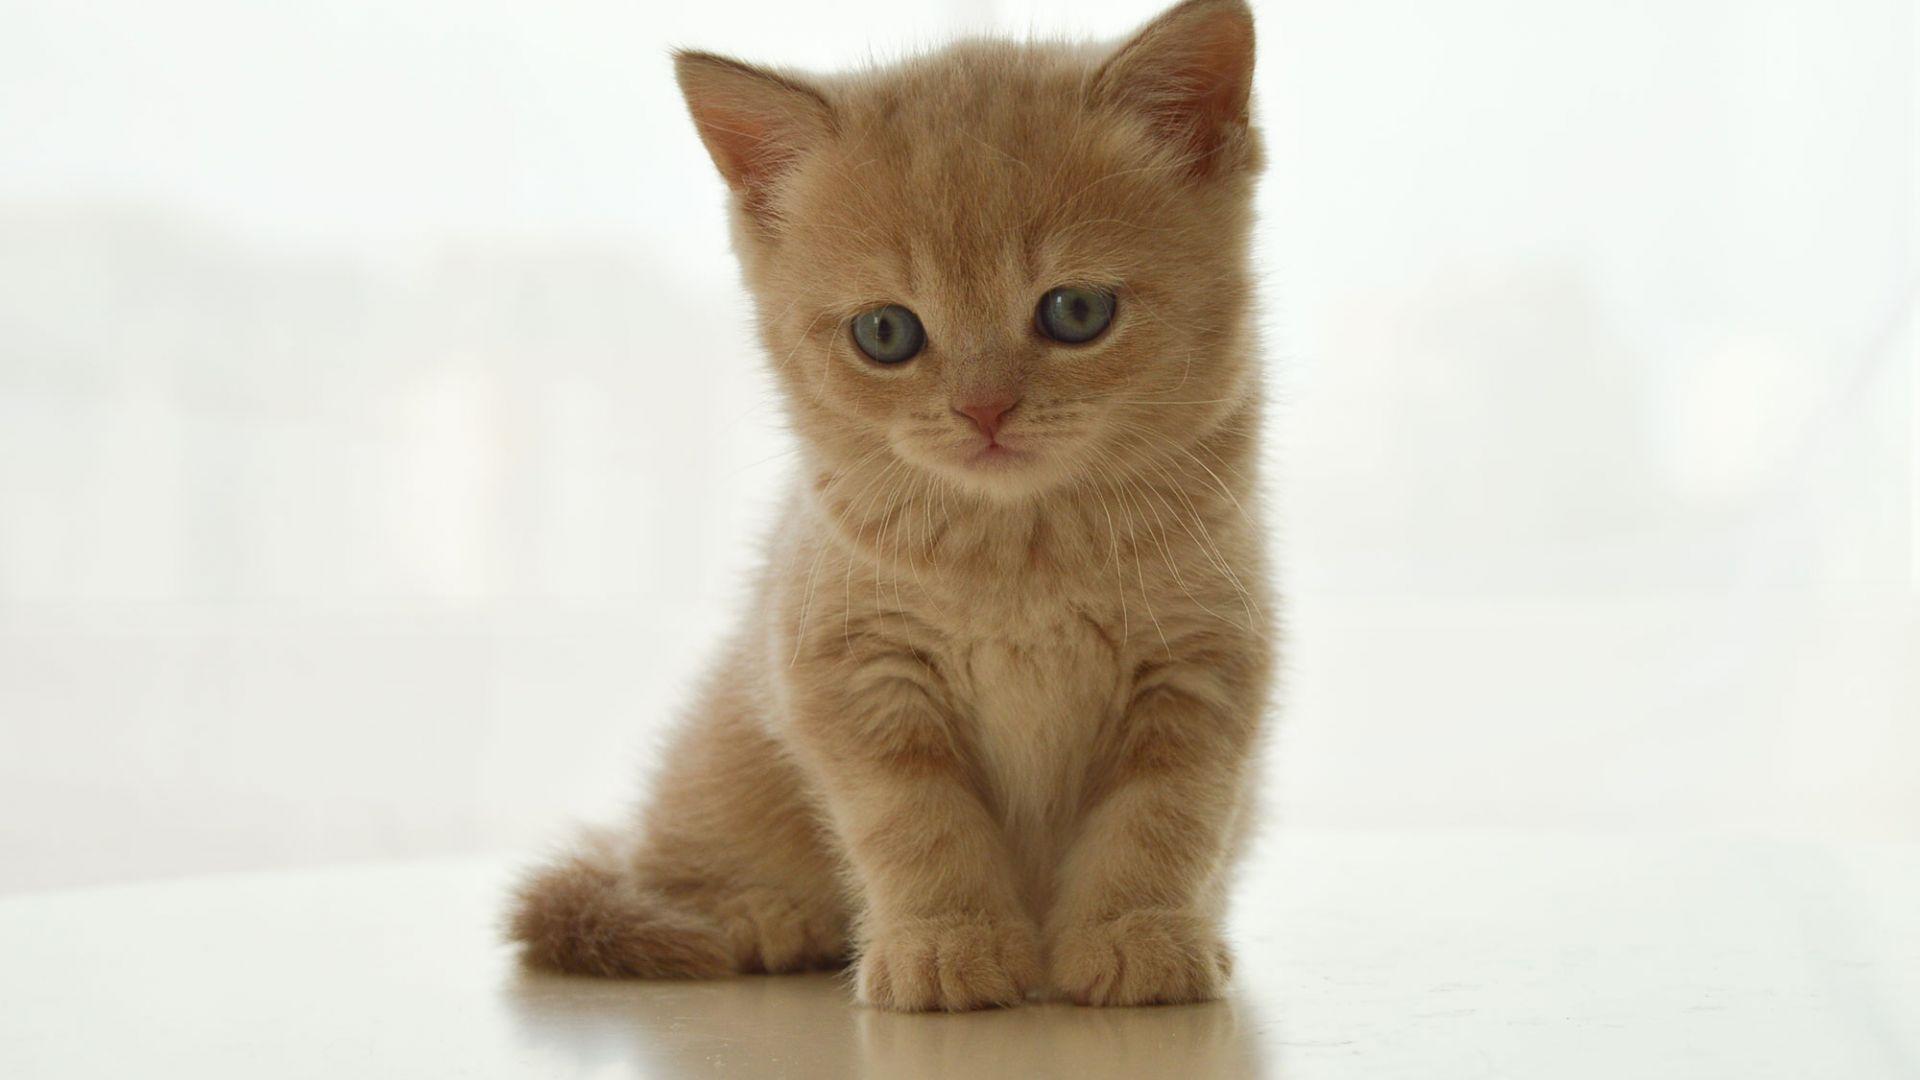 Desktop Wallpaper Cute Baby Cat Kitten Sitting Pet Hd Image Picture Background L8y5jl